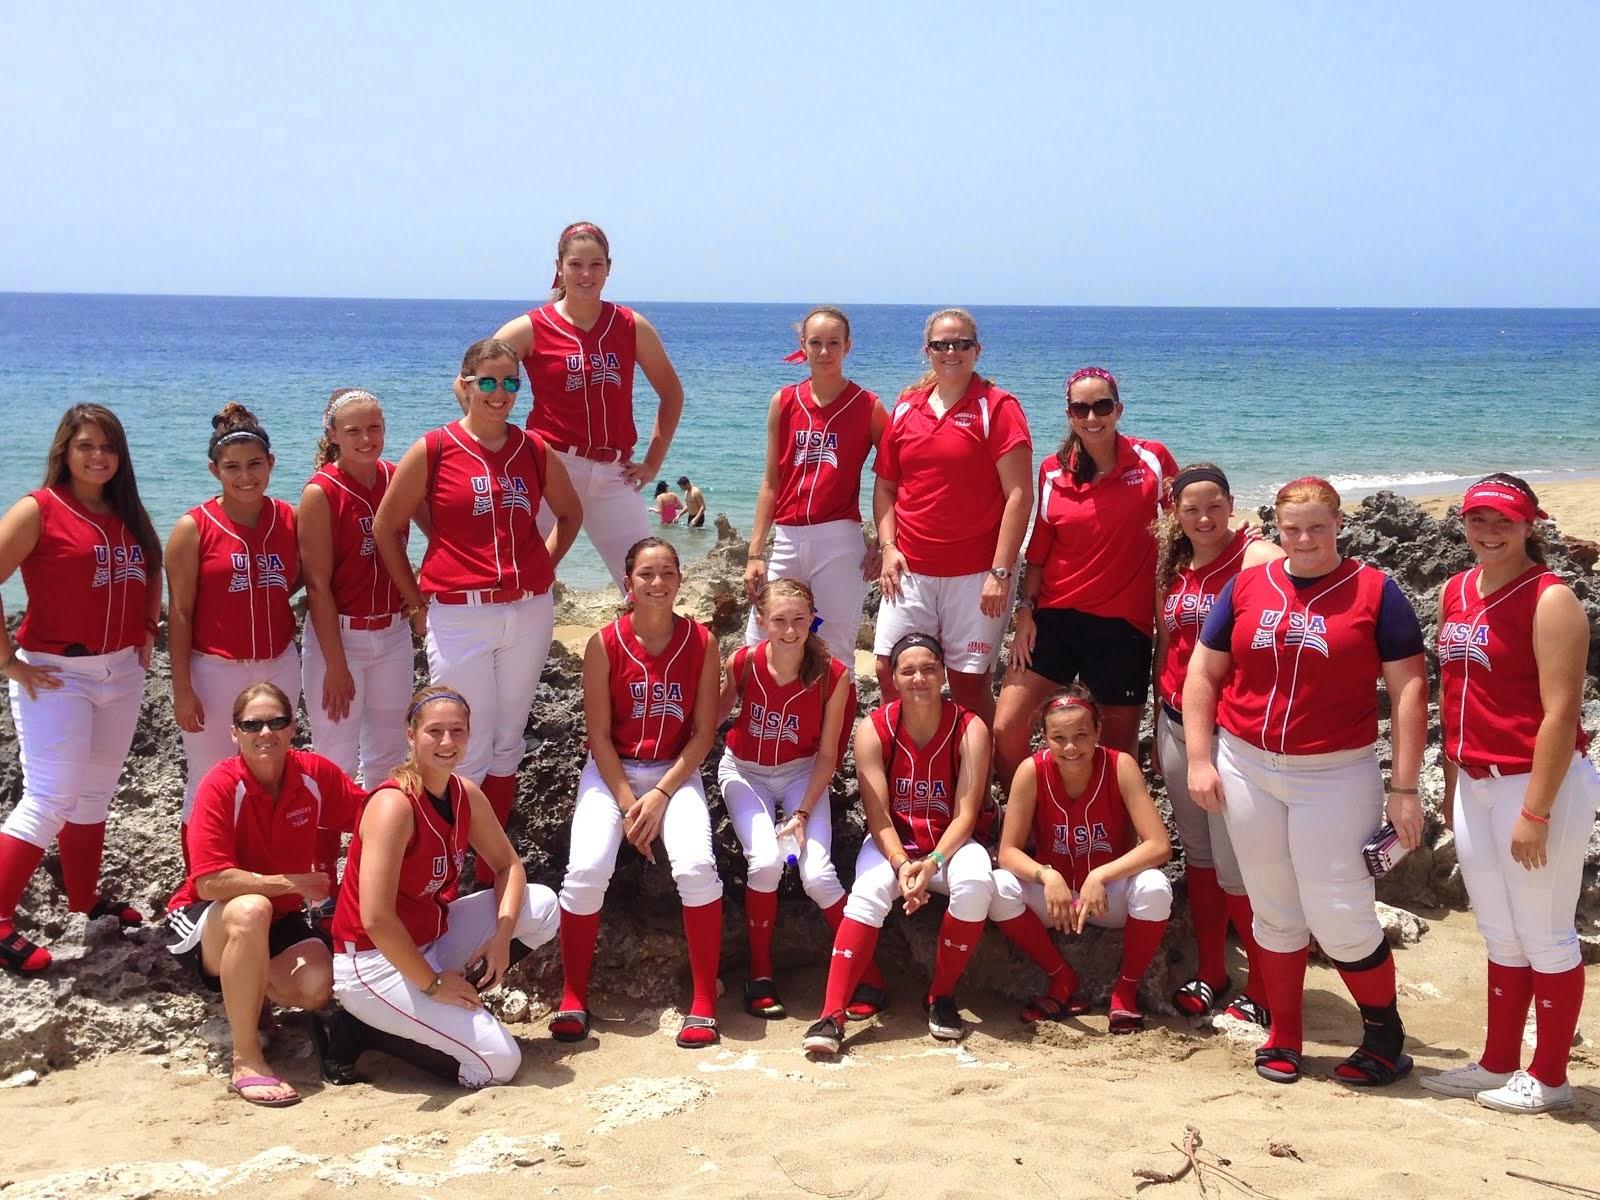 America's Team 2013